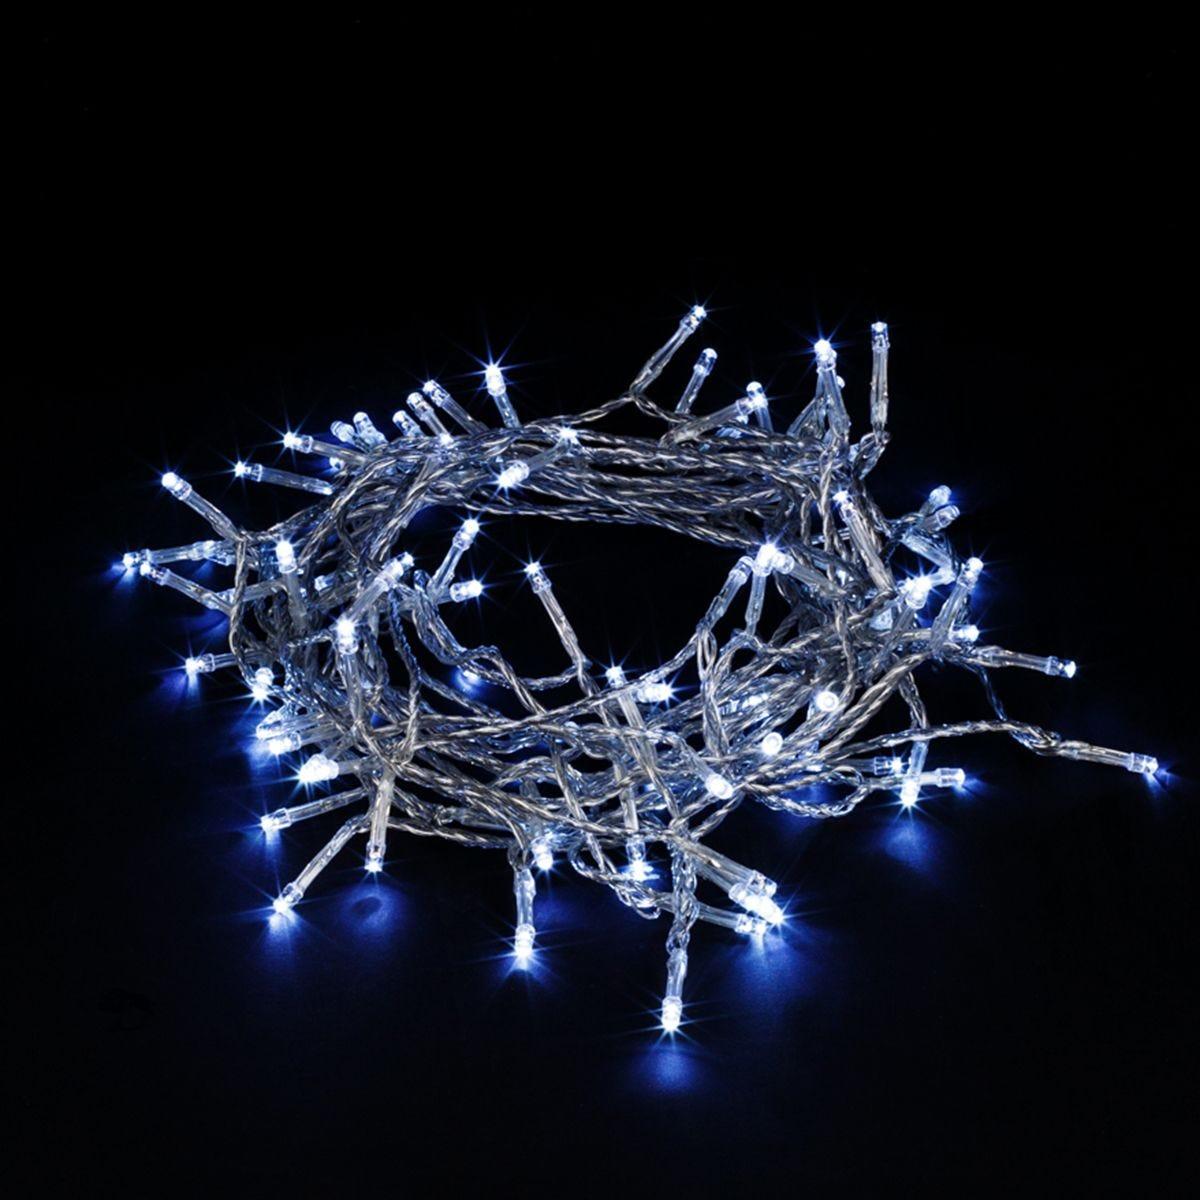 Robert Dyas 800 Transparent String Lights - Ice White